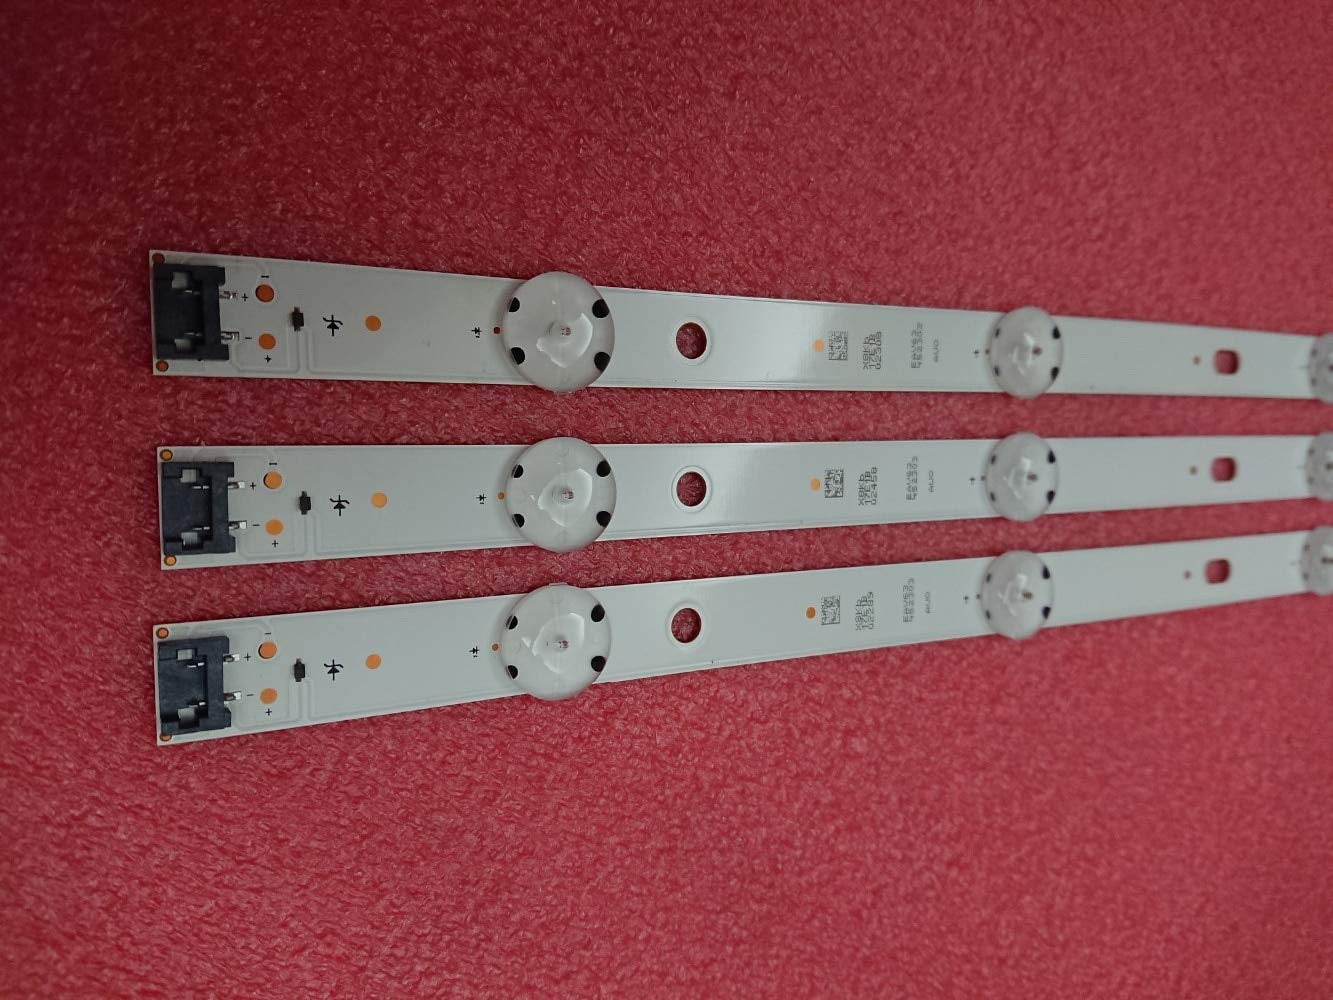 Led Iluminación Nuevo Kit 3 Piezas 8Led 850 Mm Led Backlight Strip ...